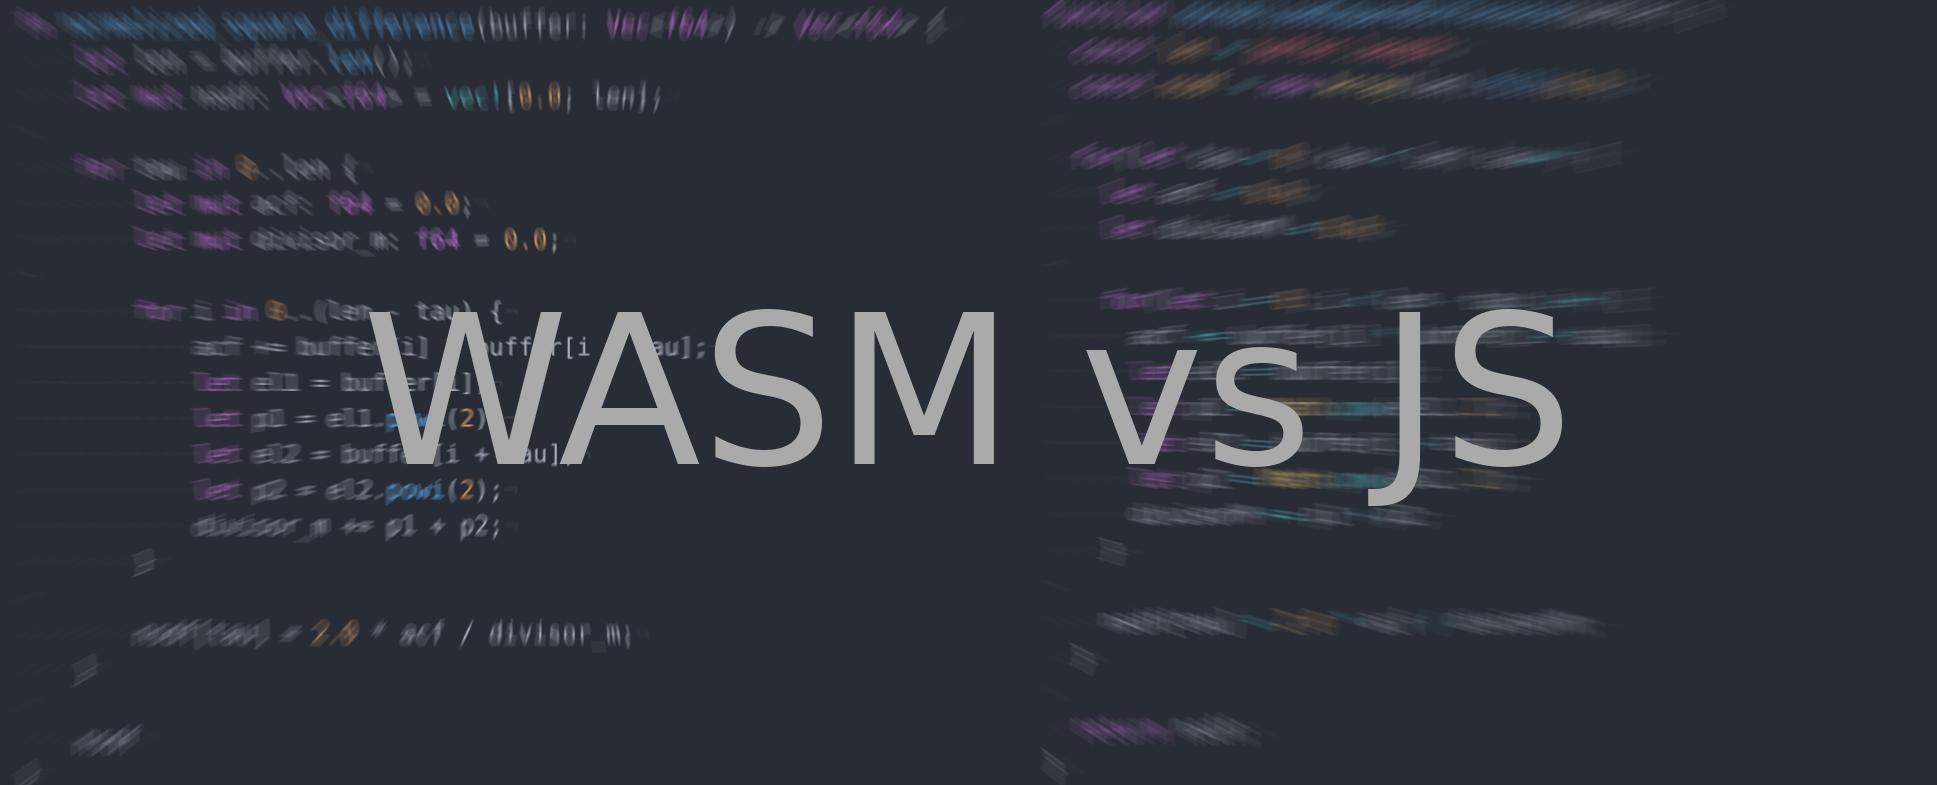 How to Make a Music App Like Gaana & Saavn? | Codementor